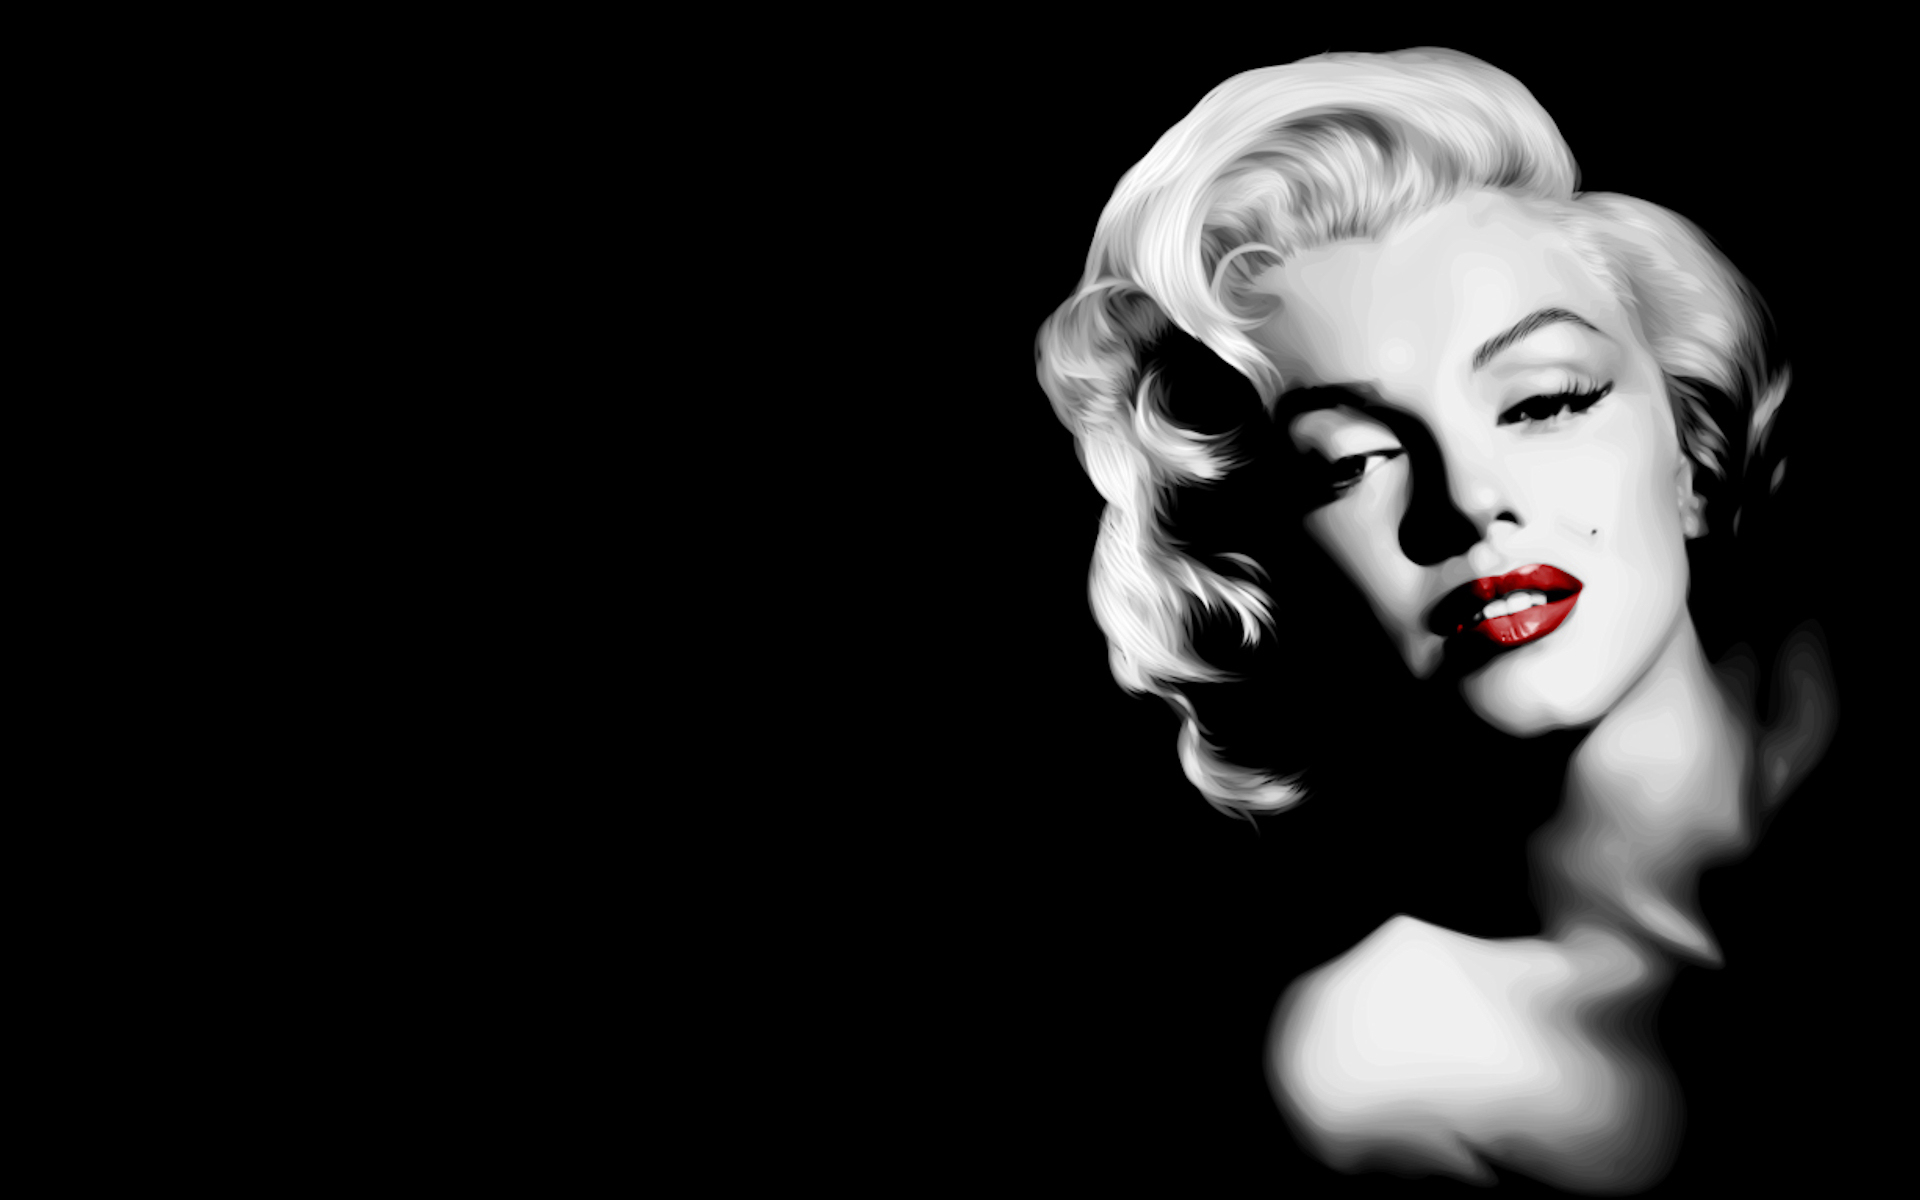 The Estate of Marilyn Monroe, LLC